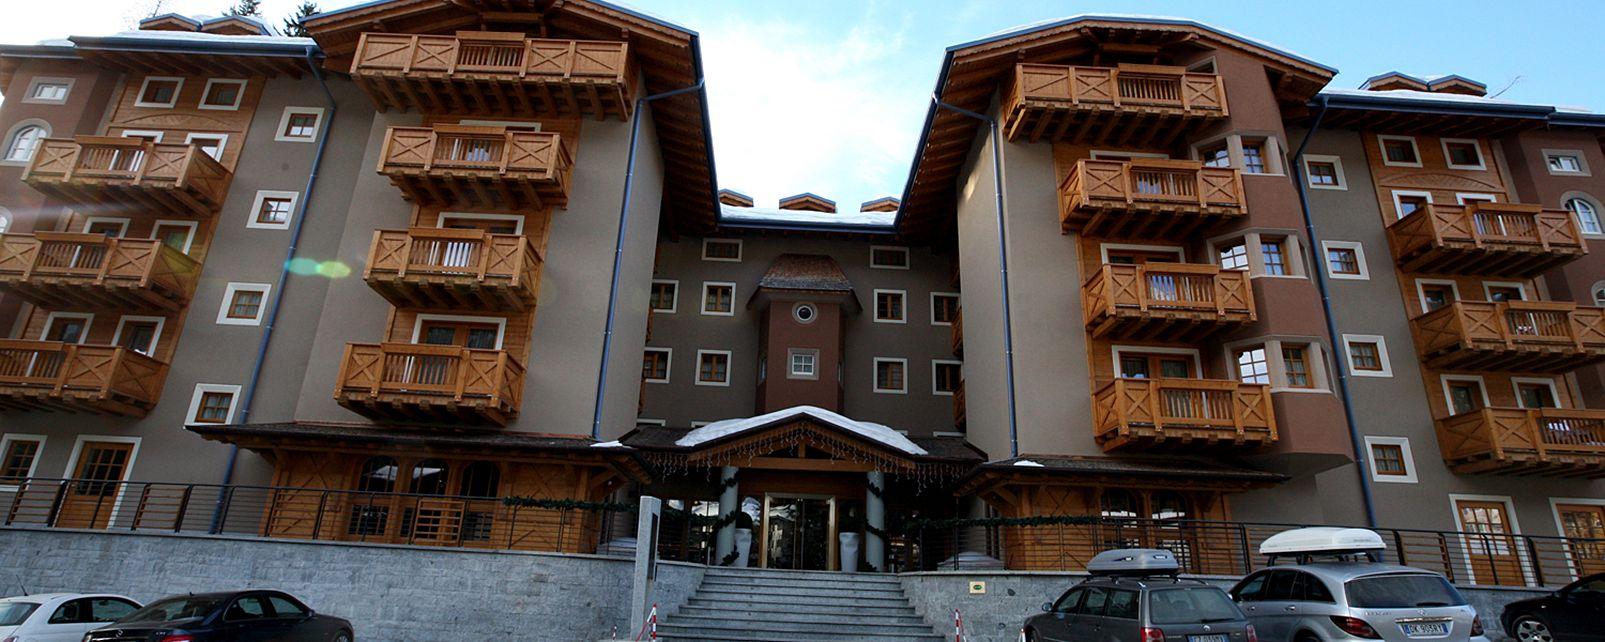 Hôtel Chalet del Brenta